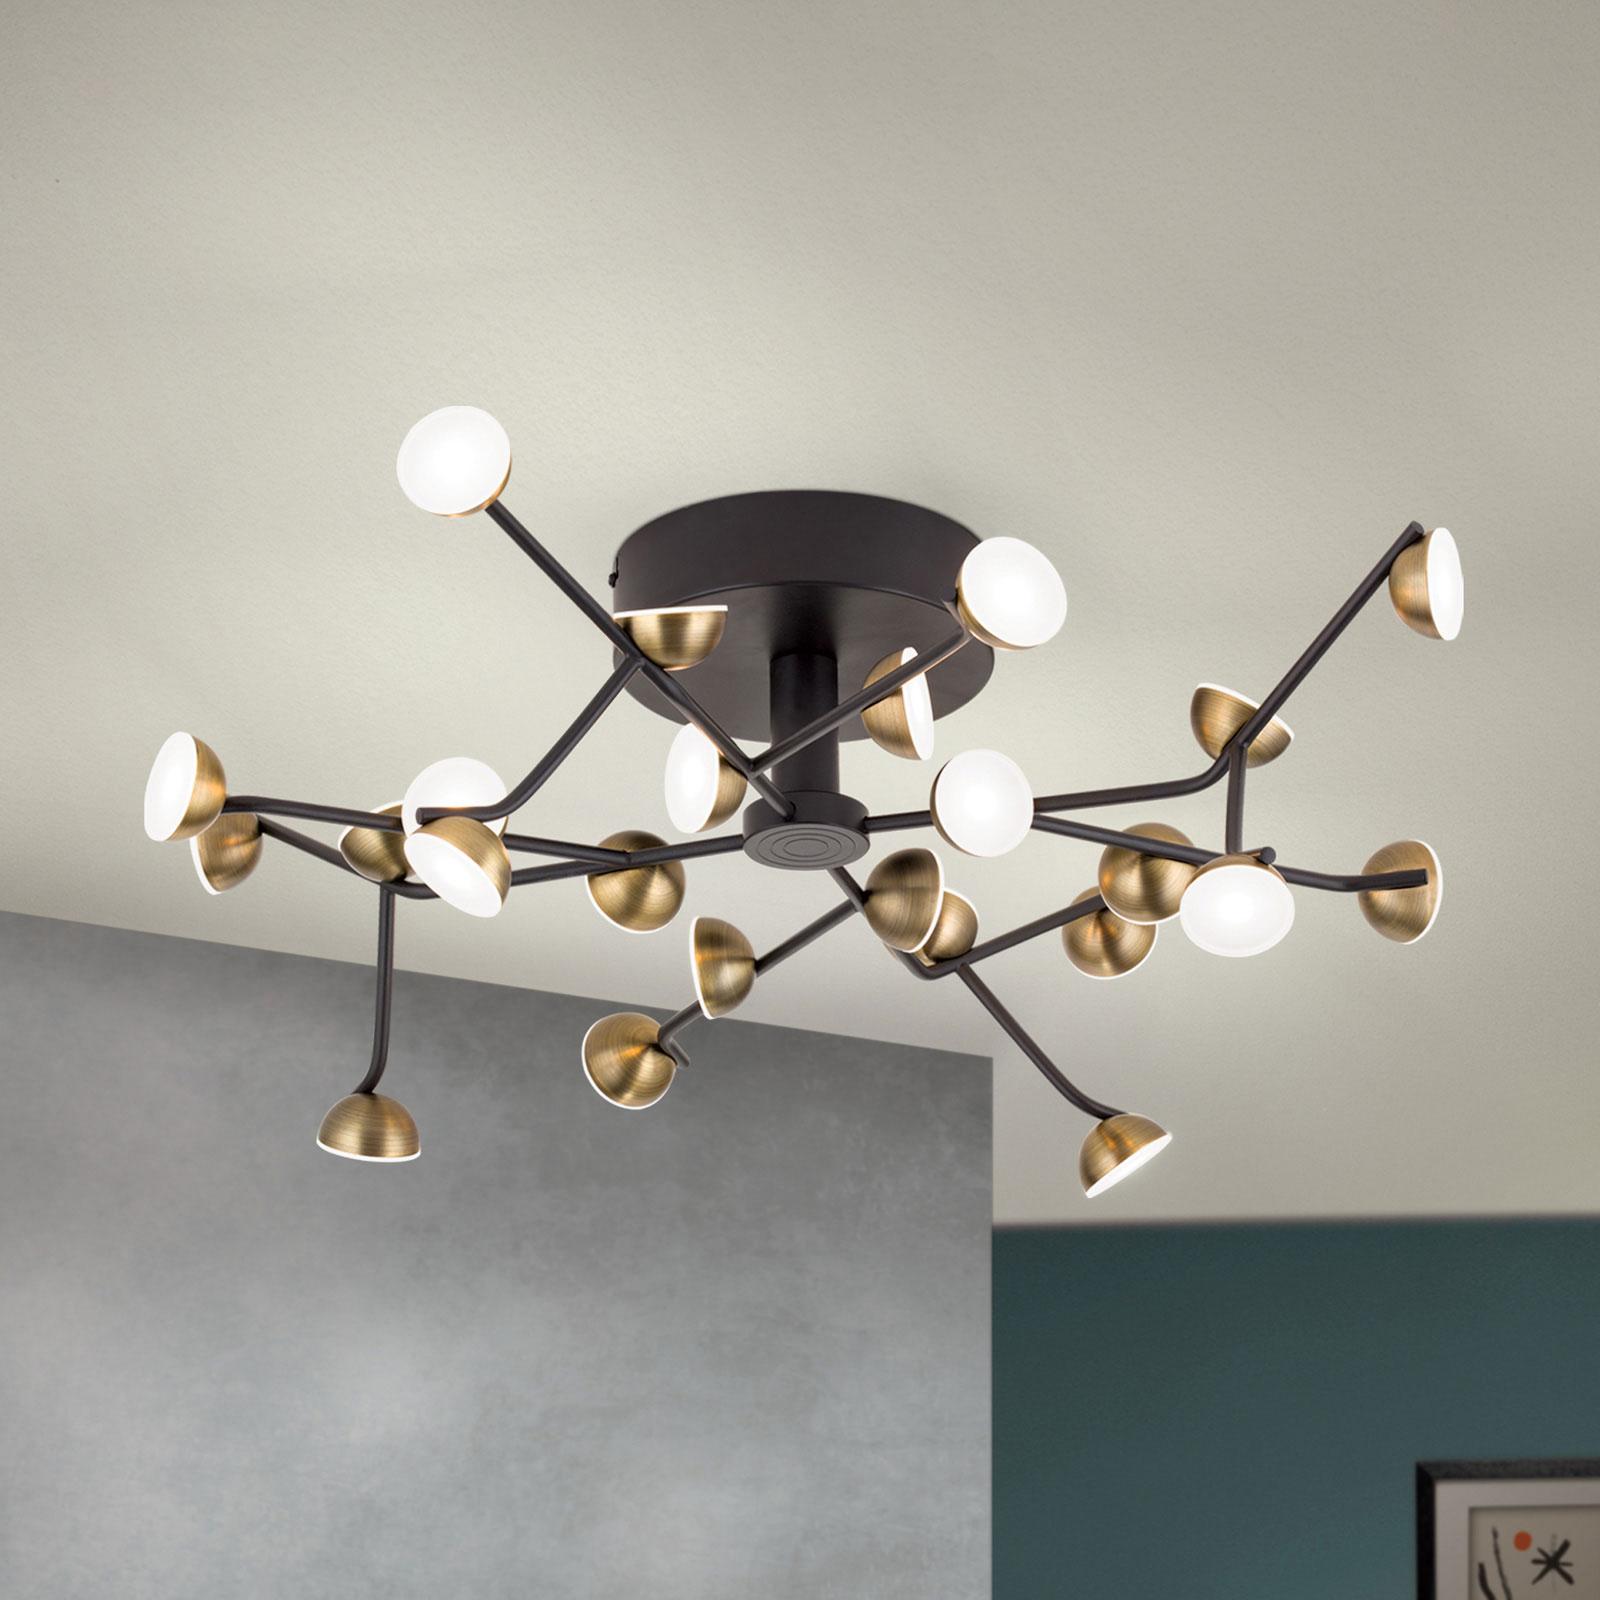 LED-Deckenleuchte Blossom, 24-flammig